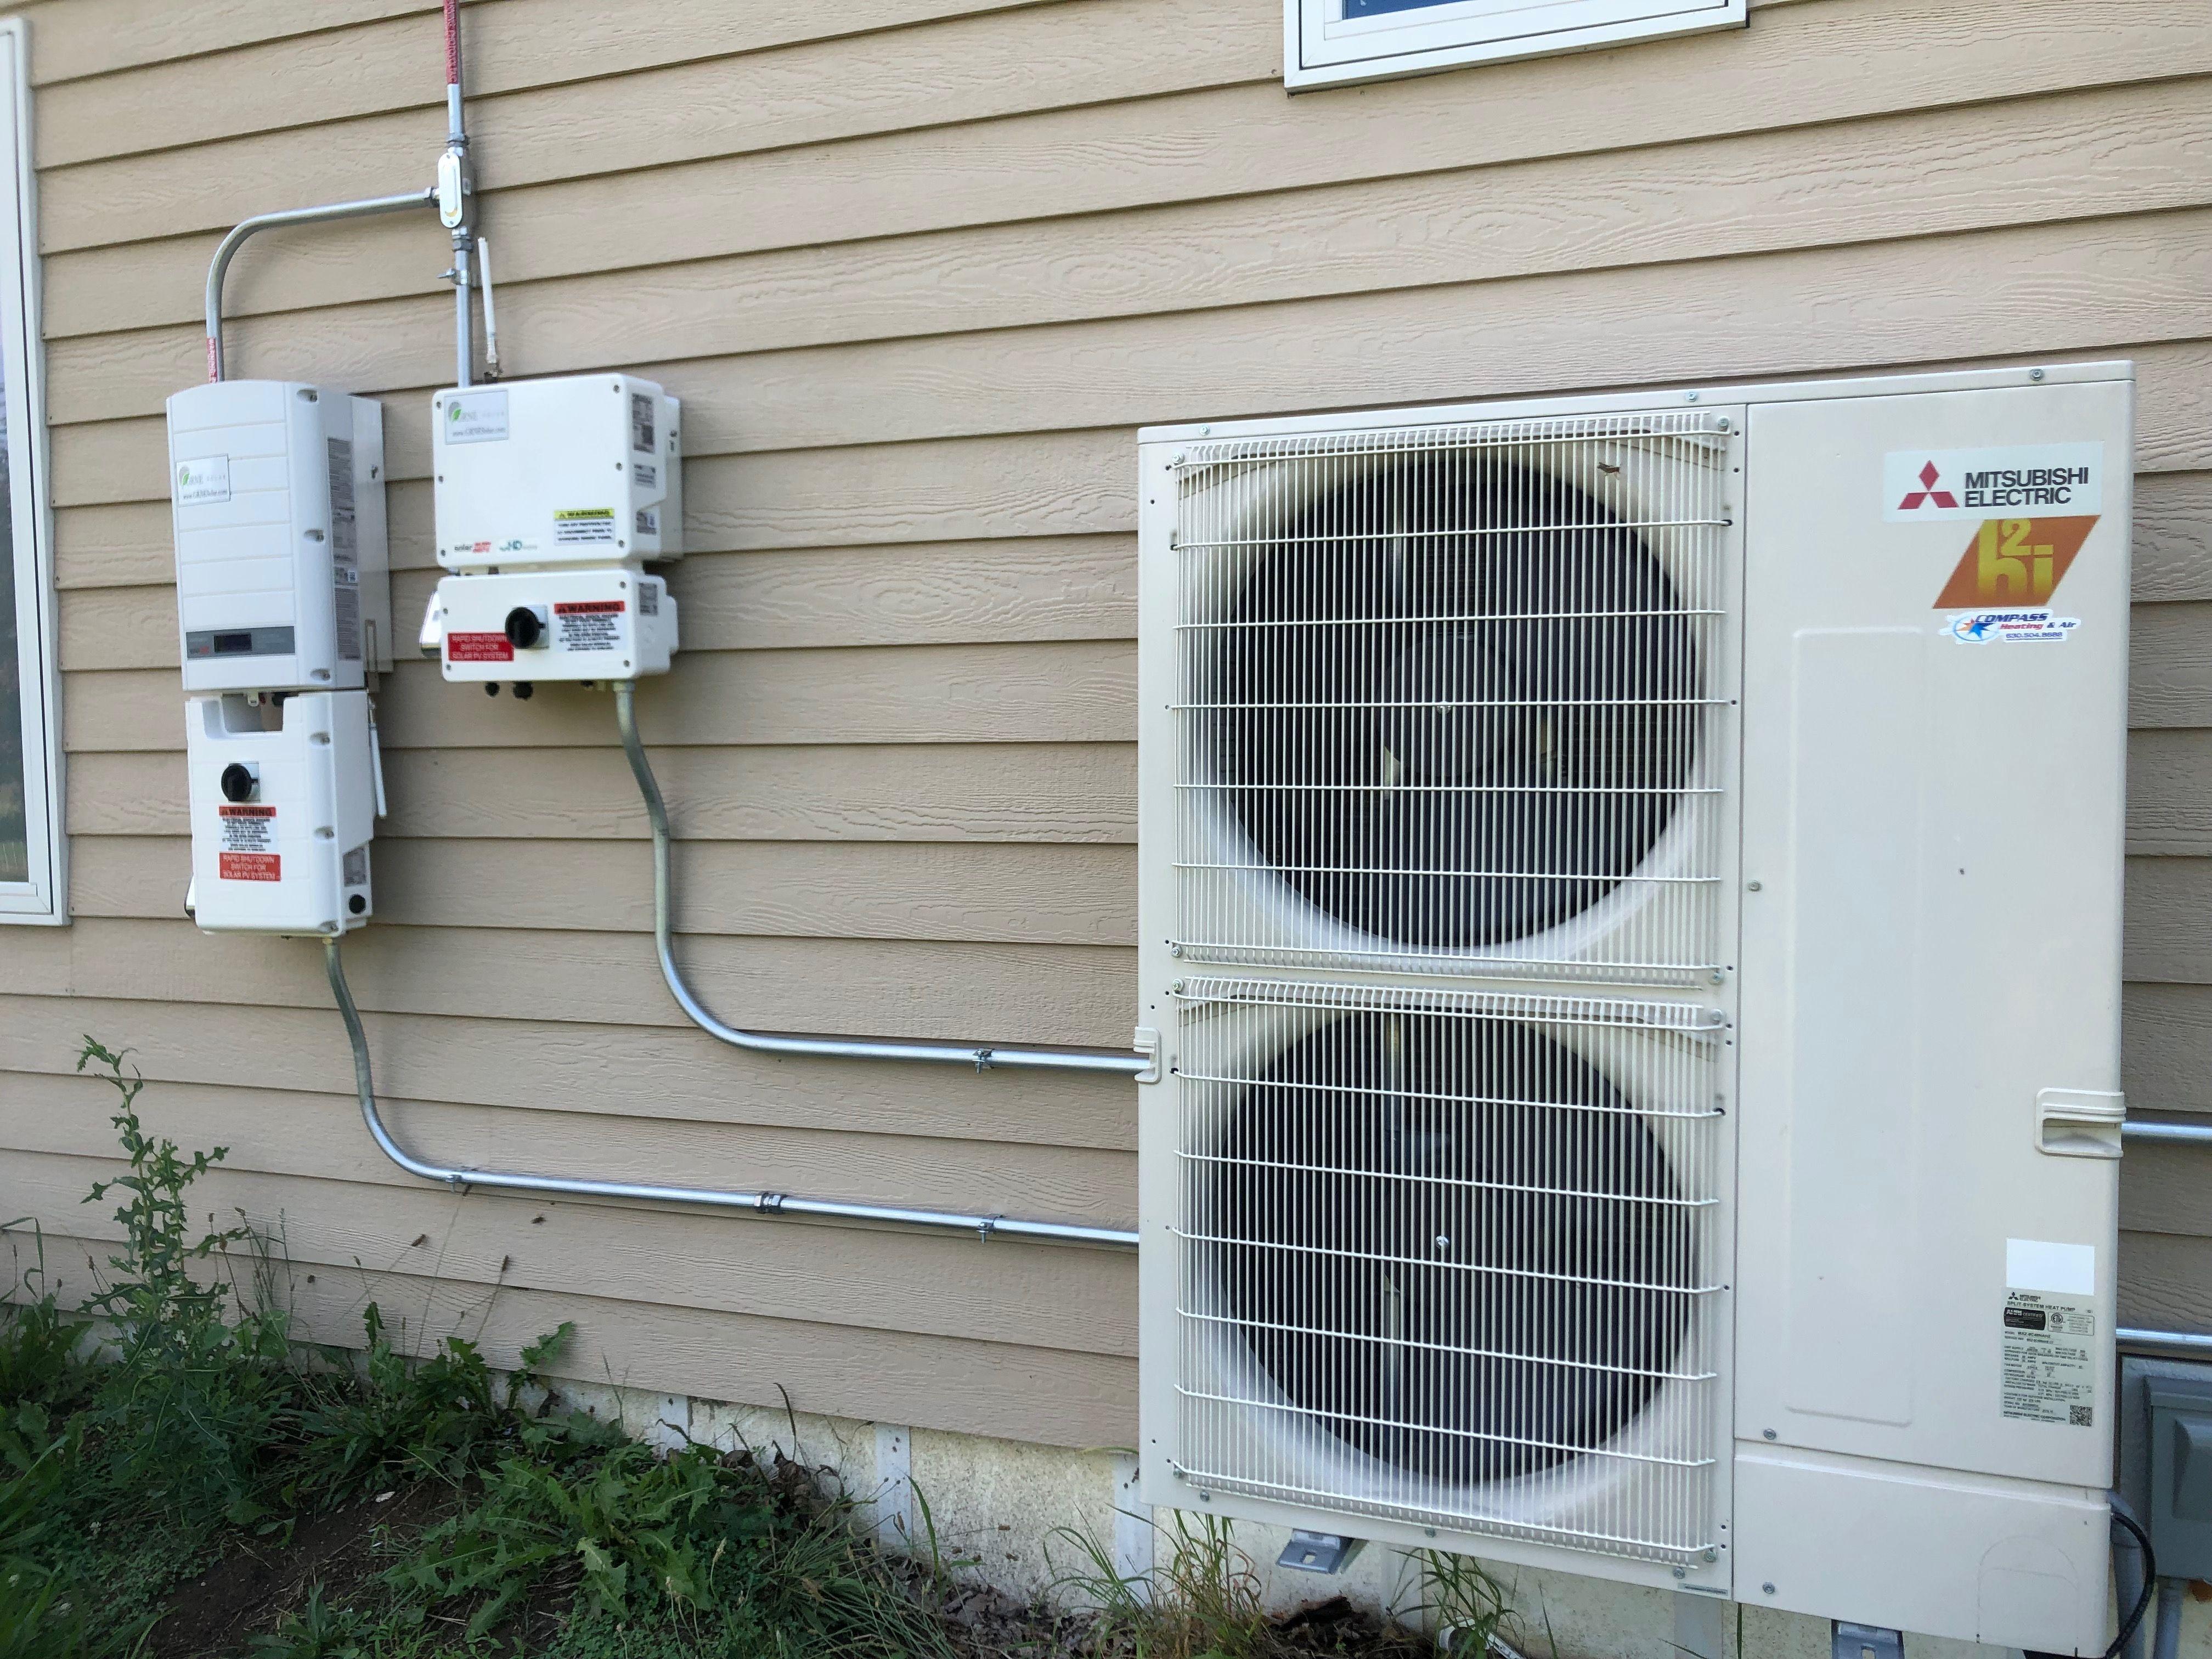 Mitsubishi 5zone hyper heat ductless multi zone heat pump